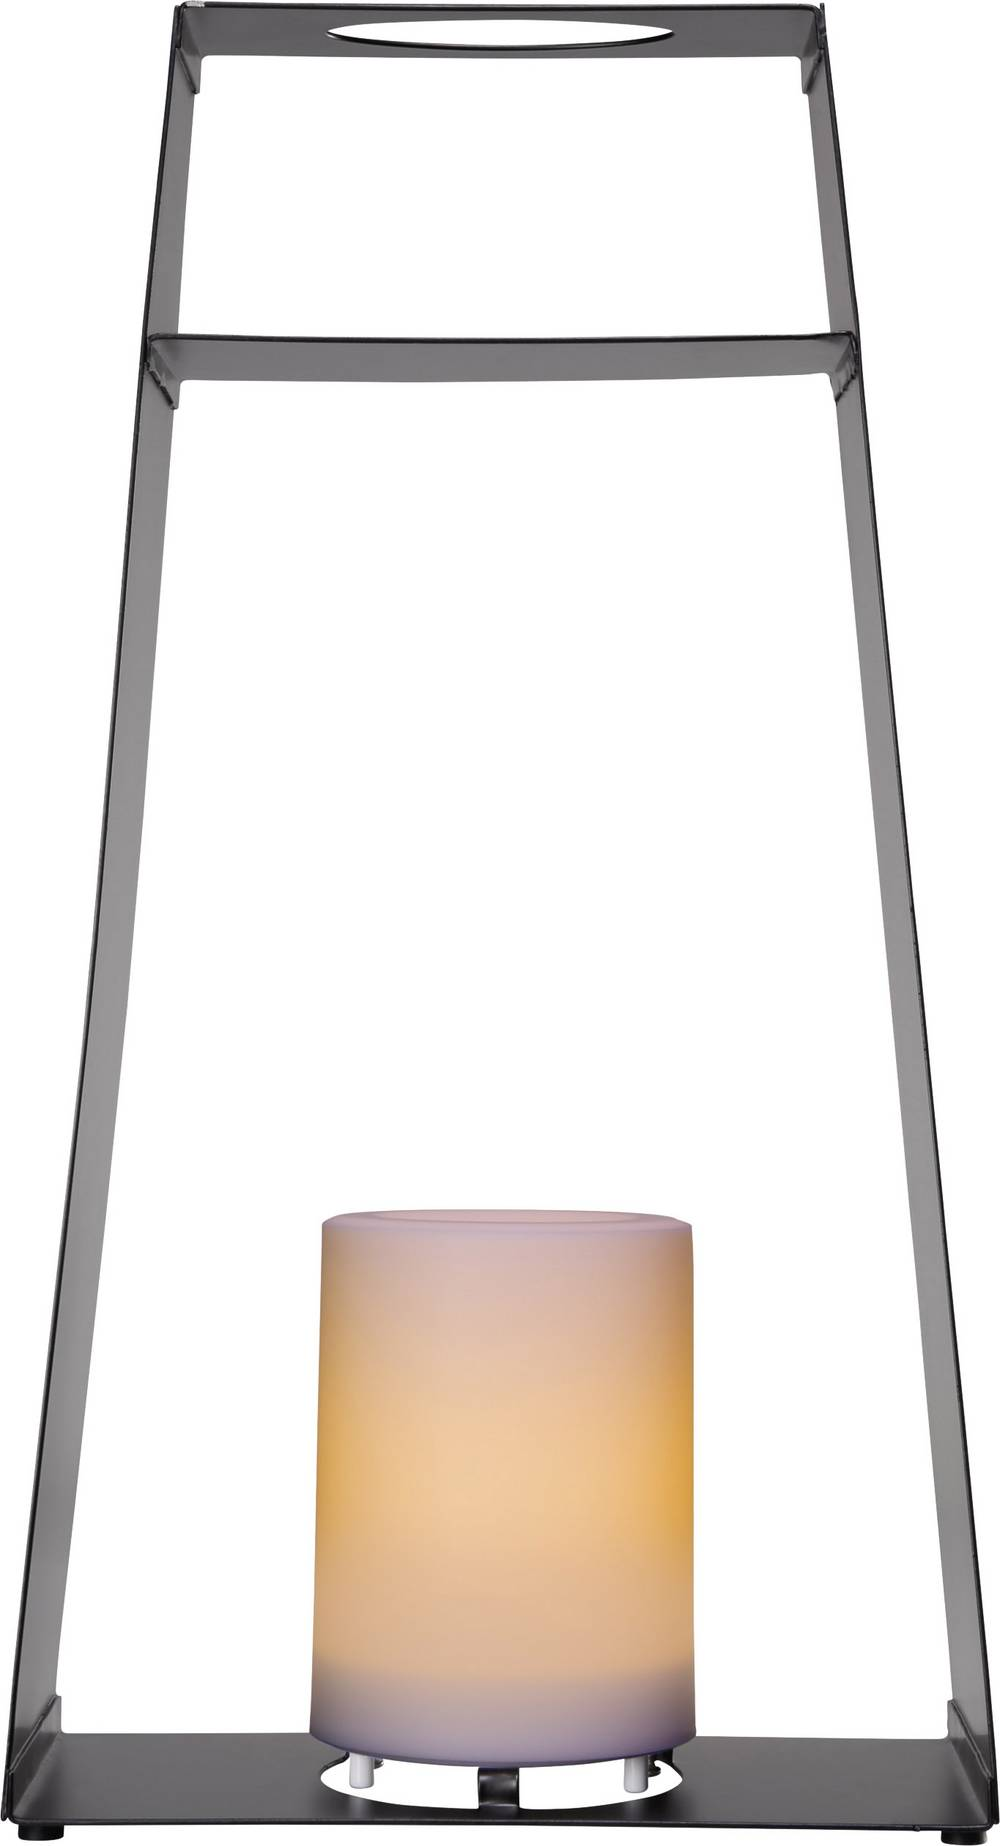 Polarlite-Dekoleuchte-LED-Amber-Iron-350-Dunkelbraun Indexbild 2